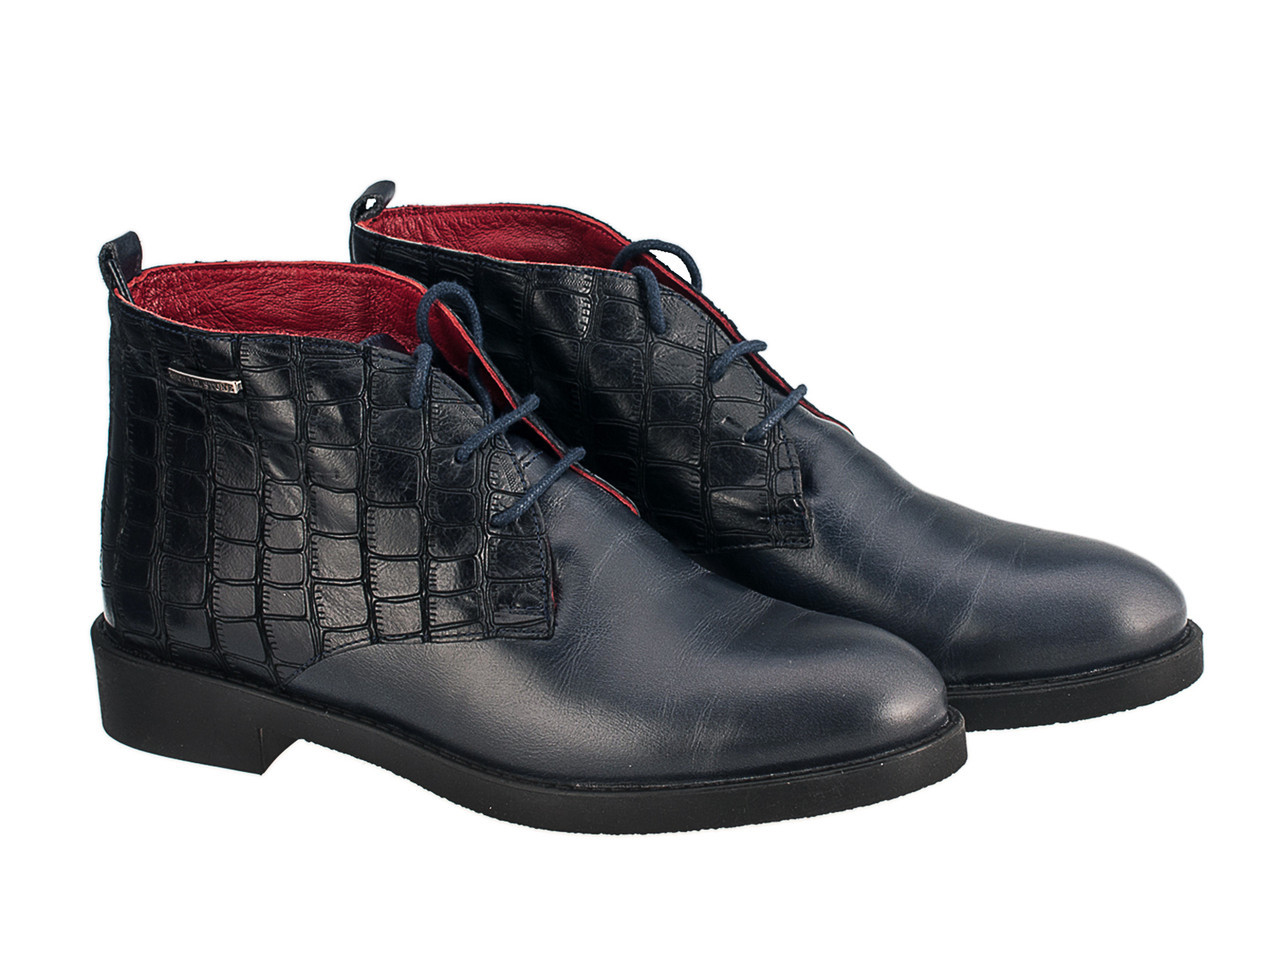 Ботинки Etor 5442-1061 36 синие